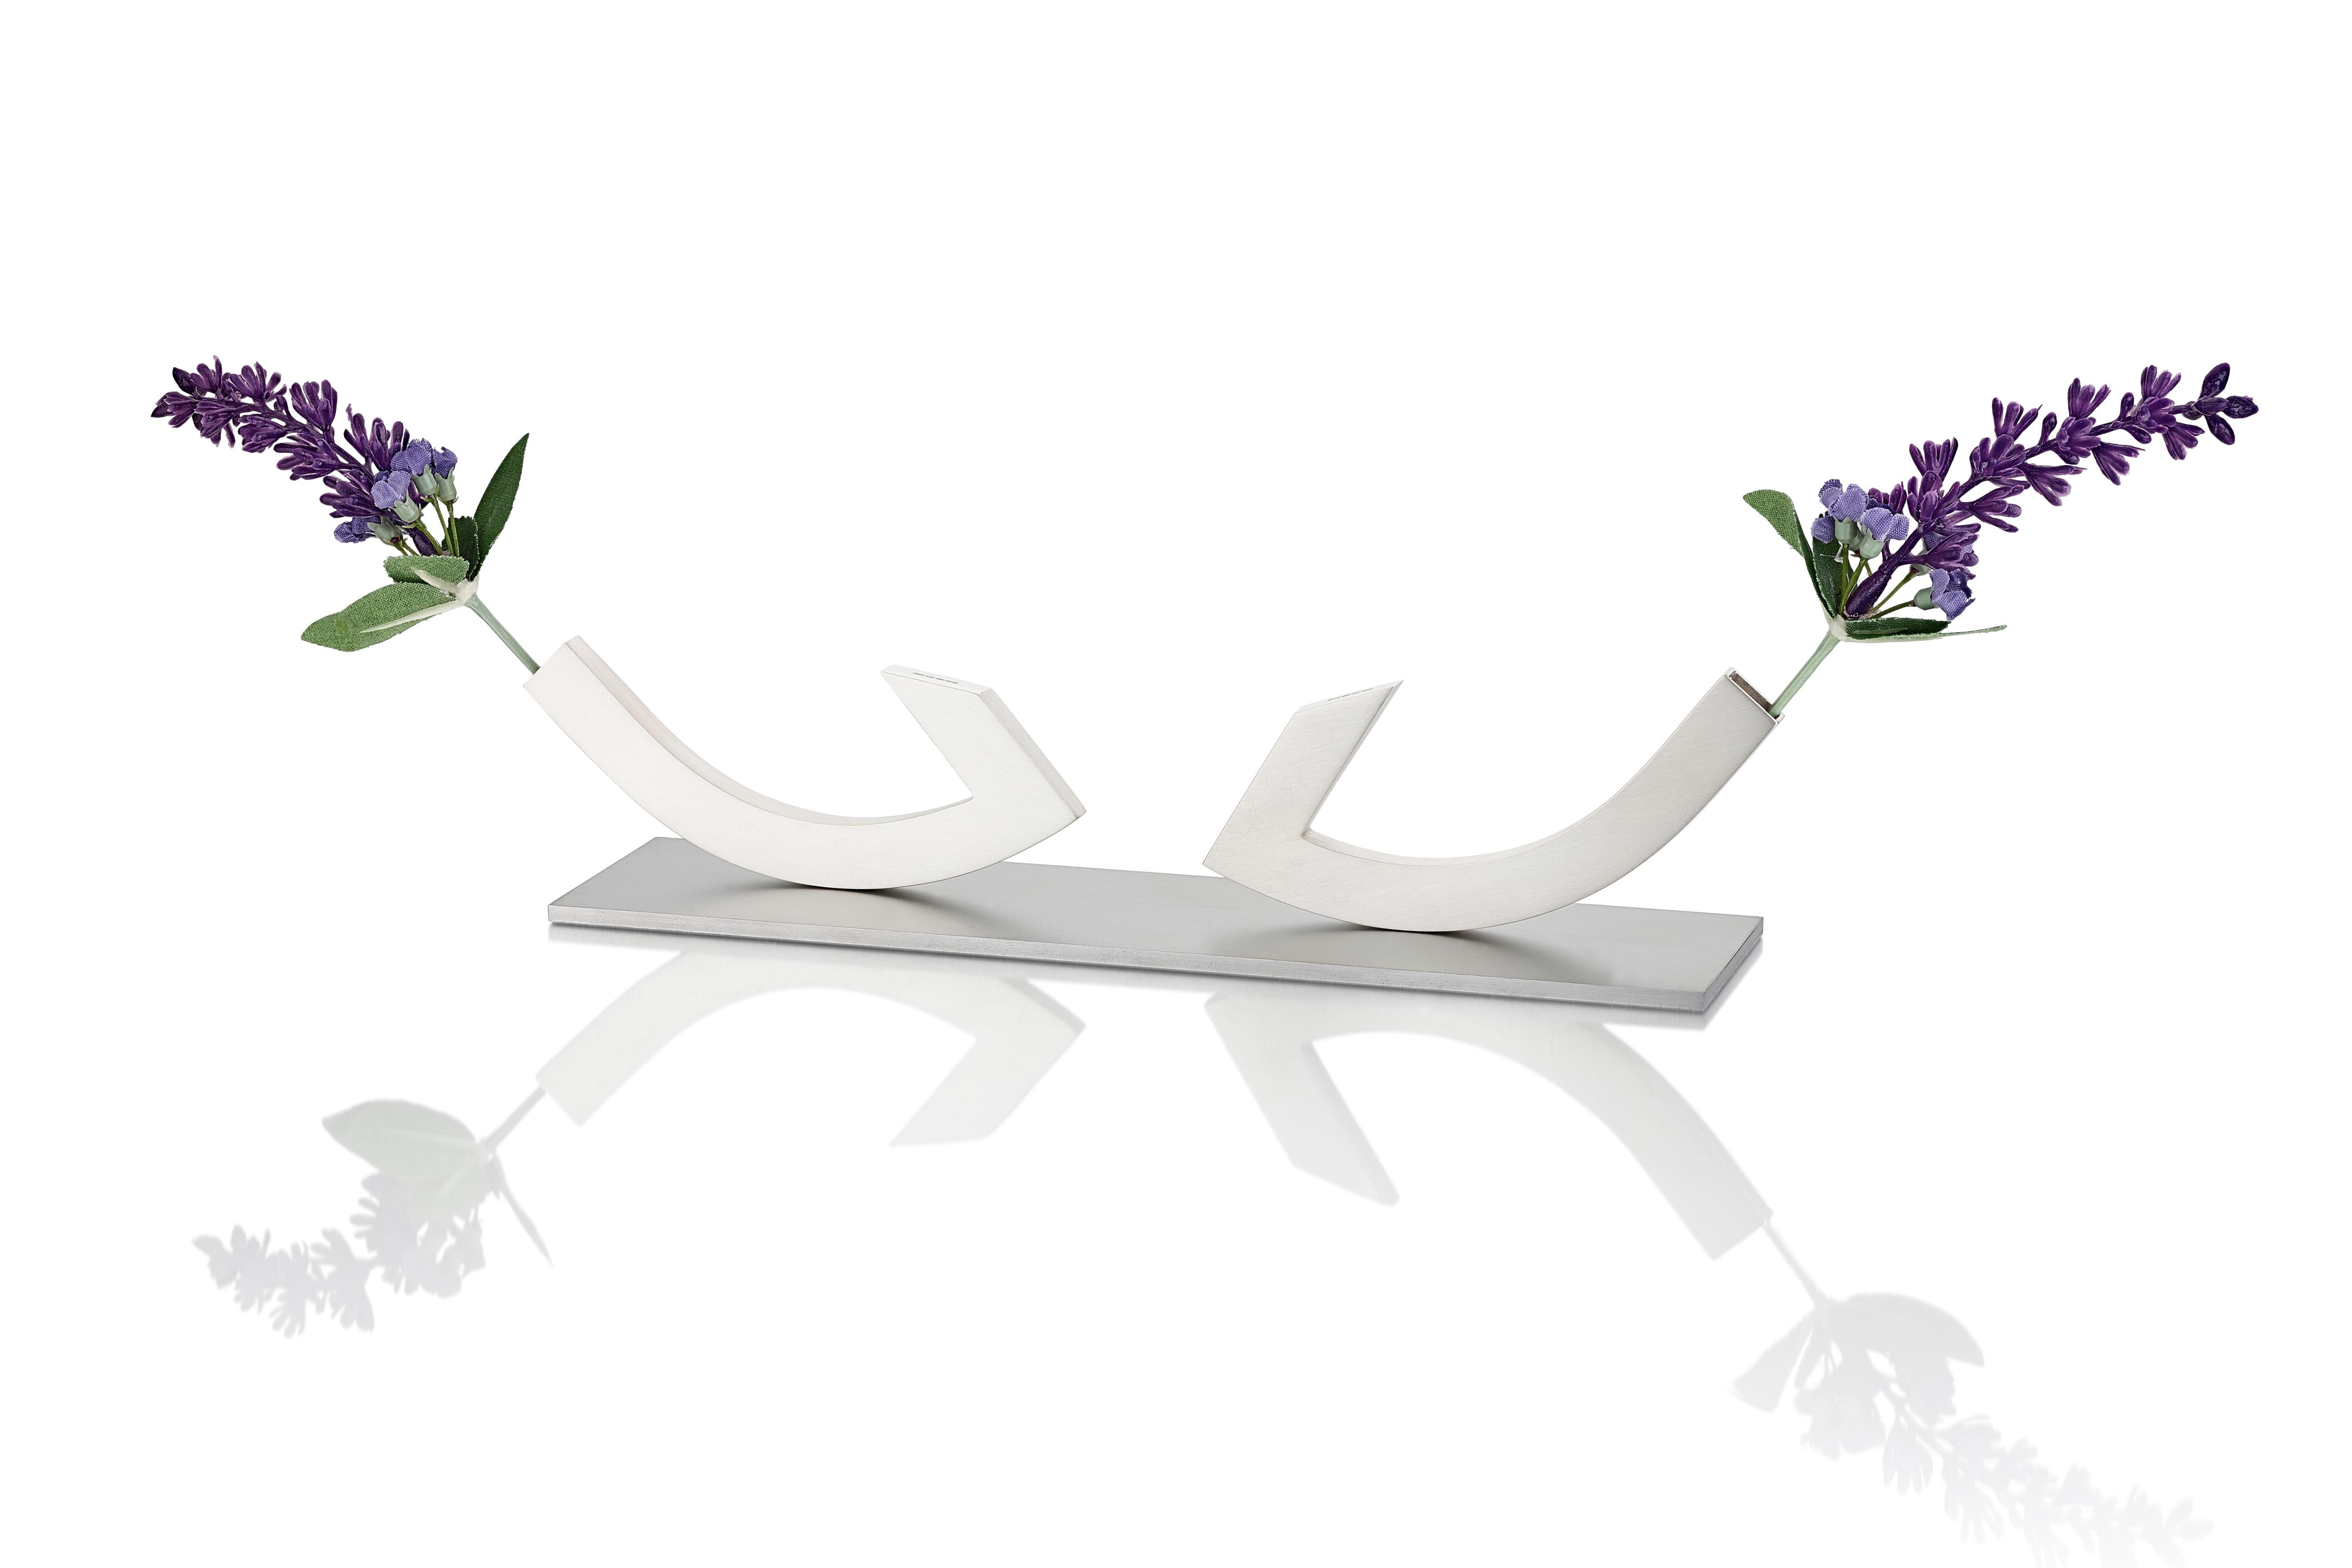 Counter Balance Vases 2 – Copyright BJRdesigns